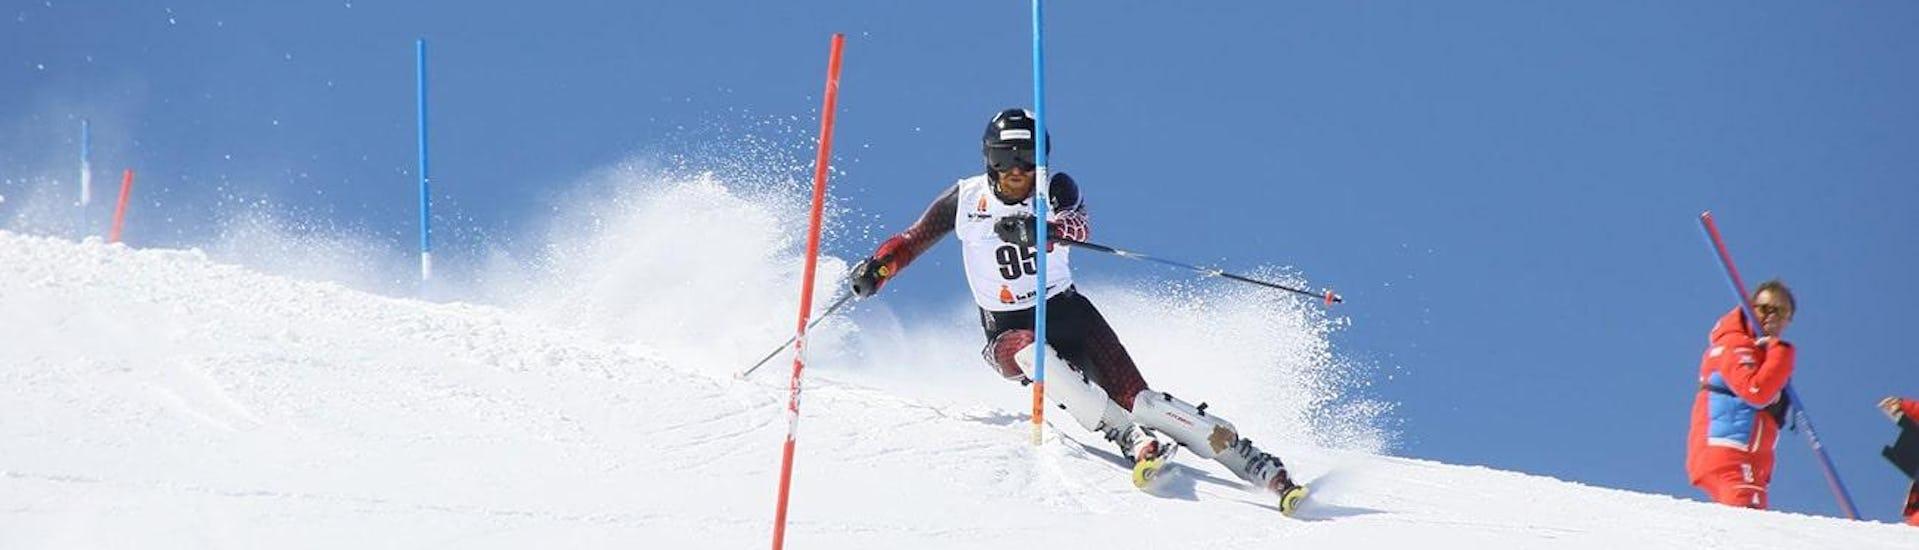 Slalom Ski Lessons Teens and Adults - Advanced